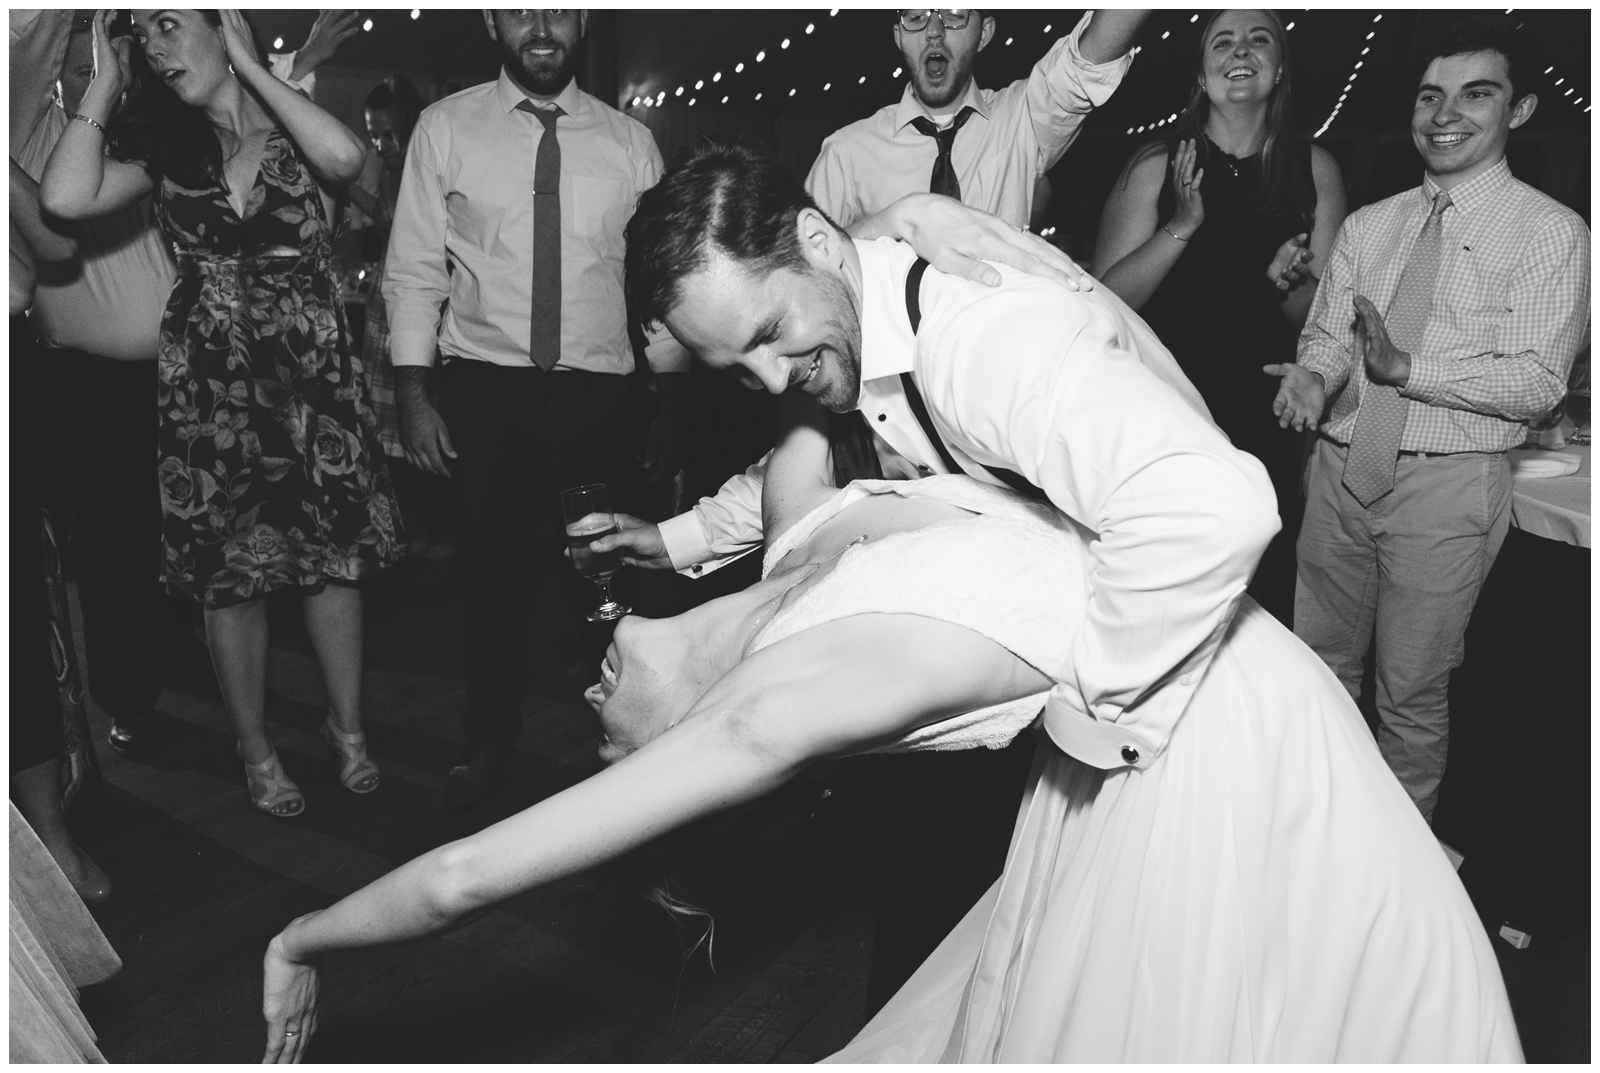 Moraine-Farm-wedding-Bailey-Q-Photo-Massachusetts-wedding-photpgrapher-178.jpg